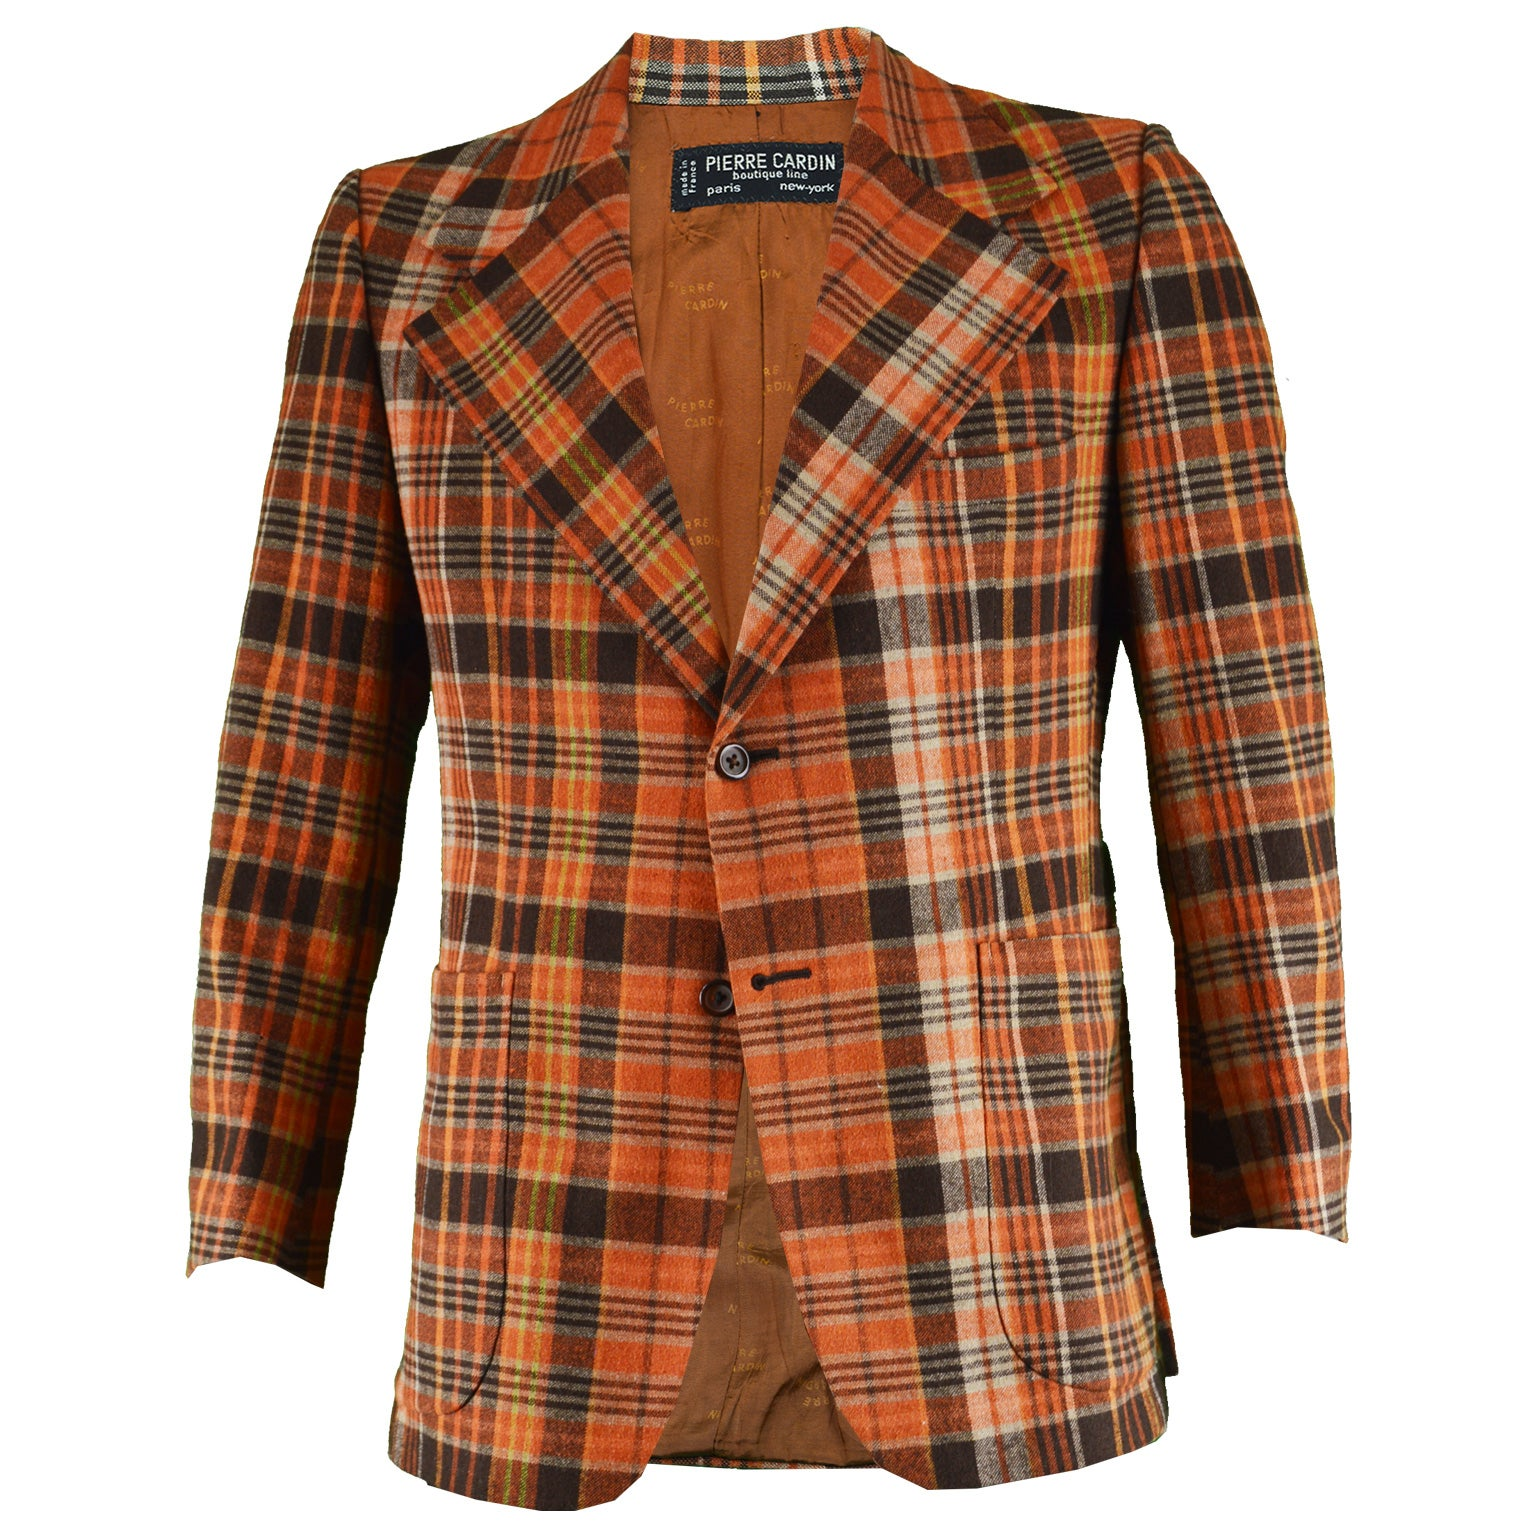 6988fc98efc2 Pierre Cardin Boutique Men's Orange Plaid Check Vintage Blazer Jacket,  1970s For Sale at 1stdibs